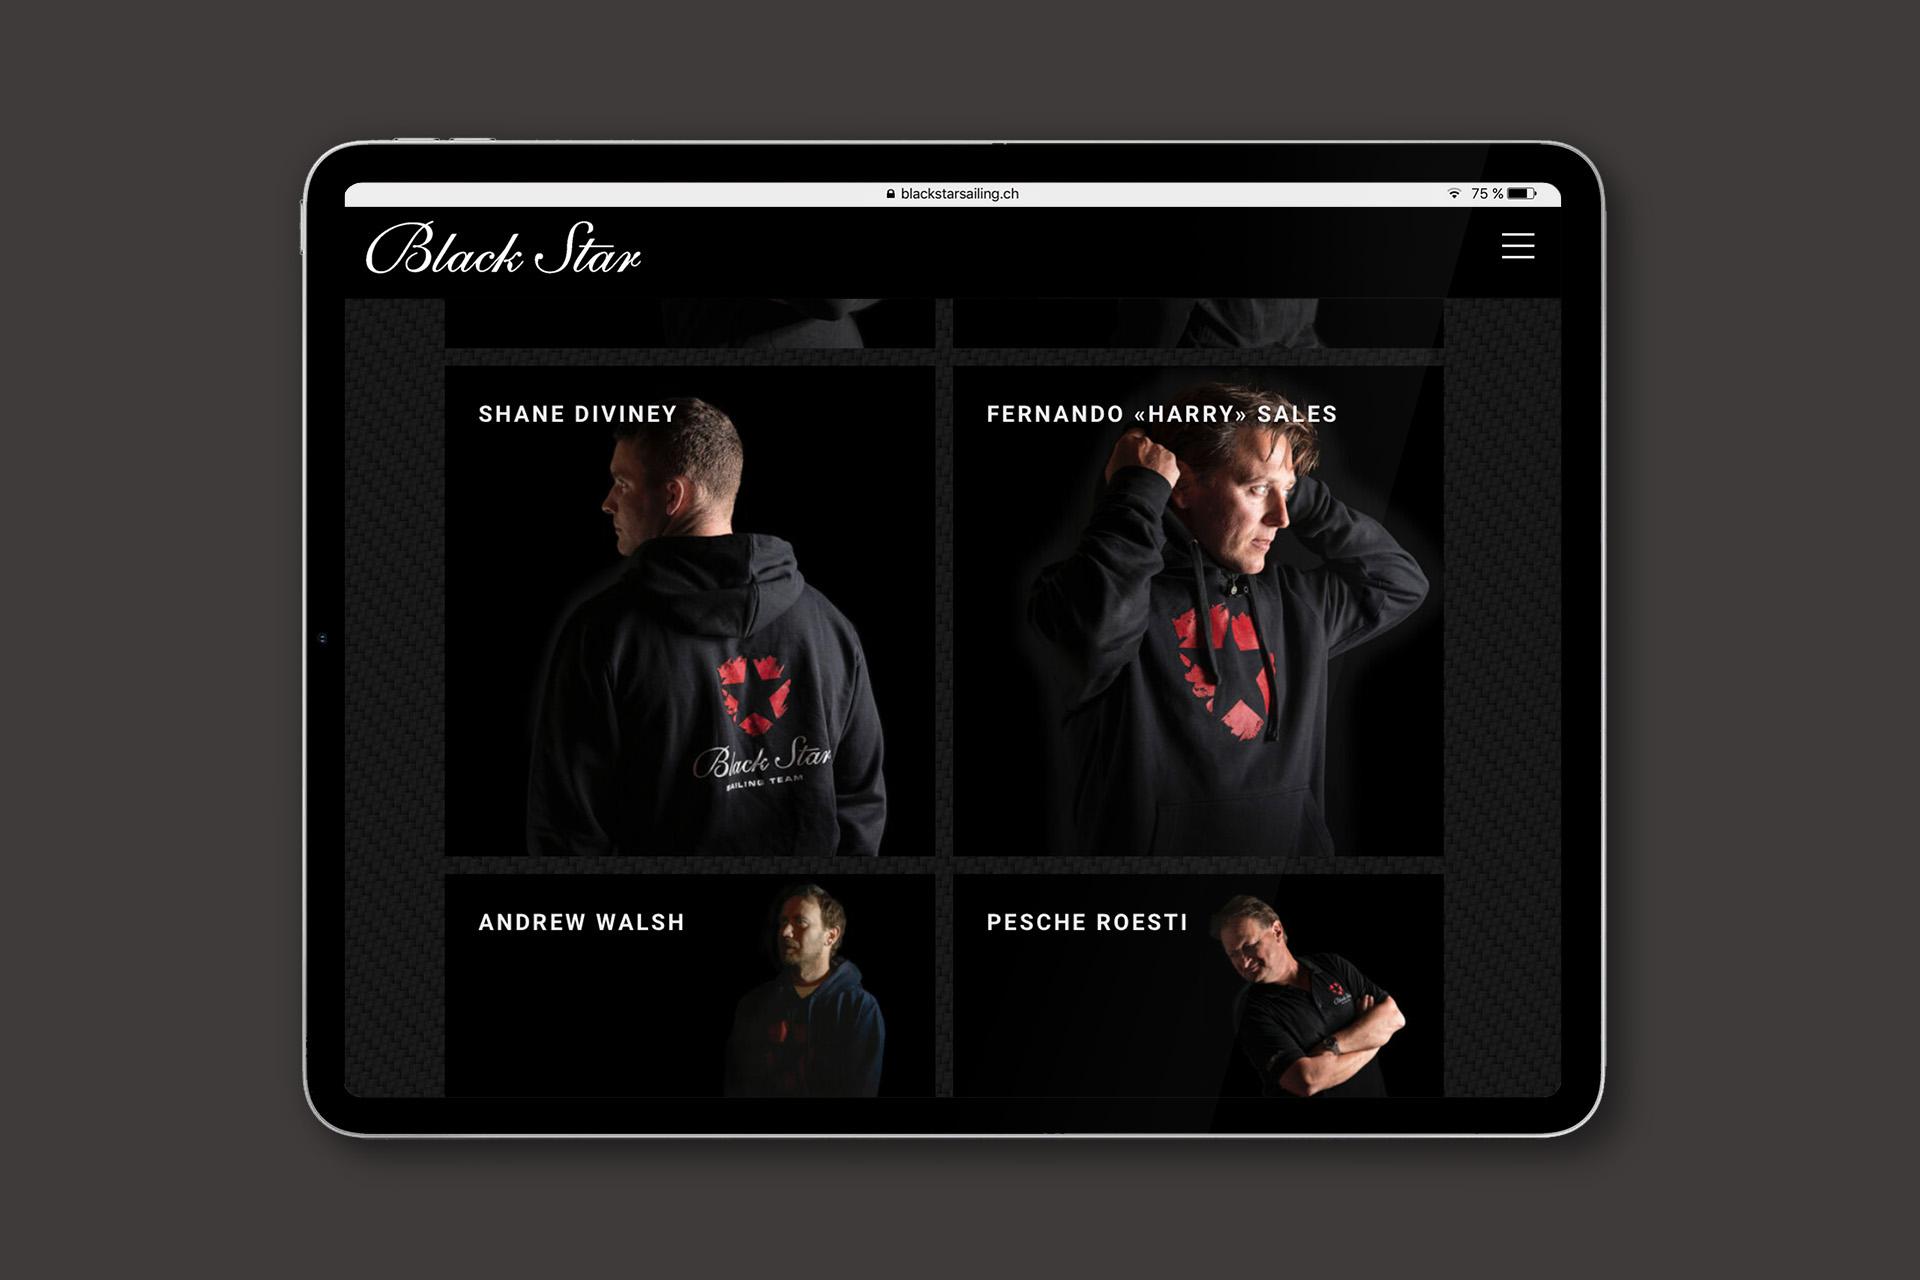 BlackStarSailing_iPad_13